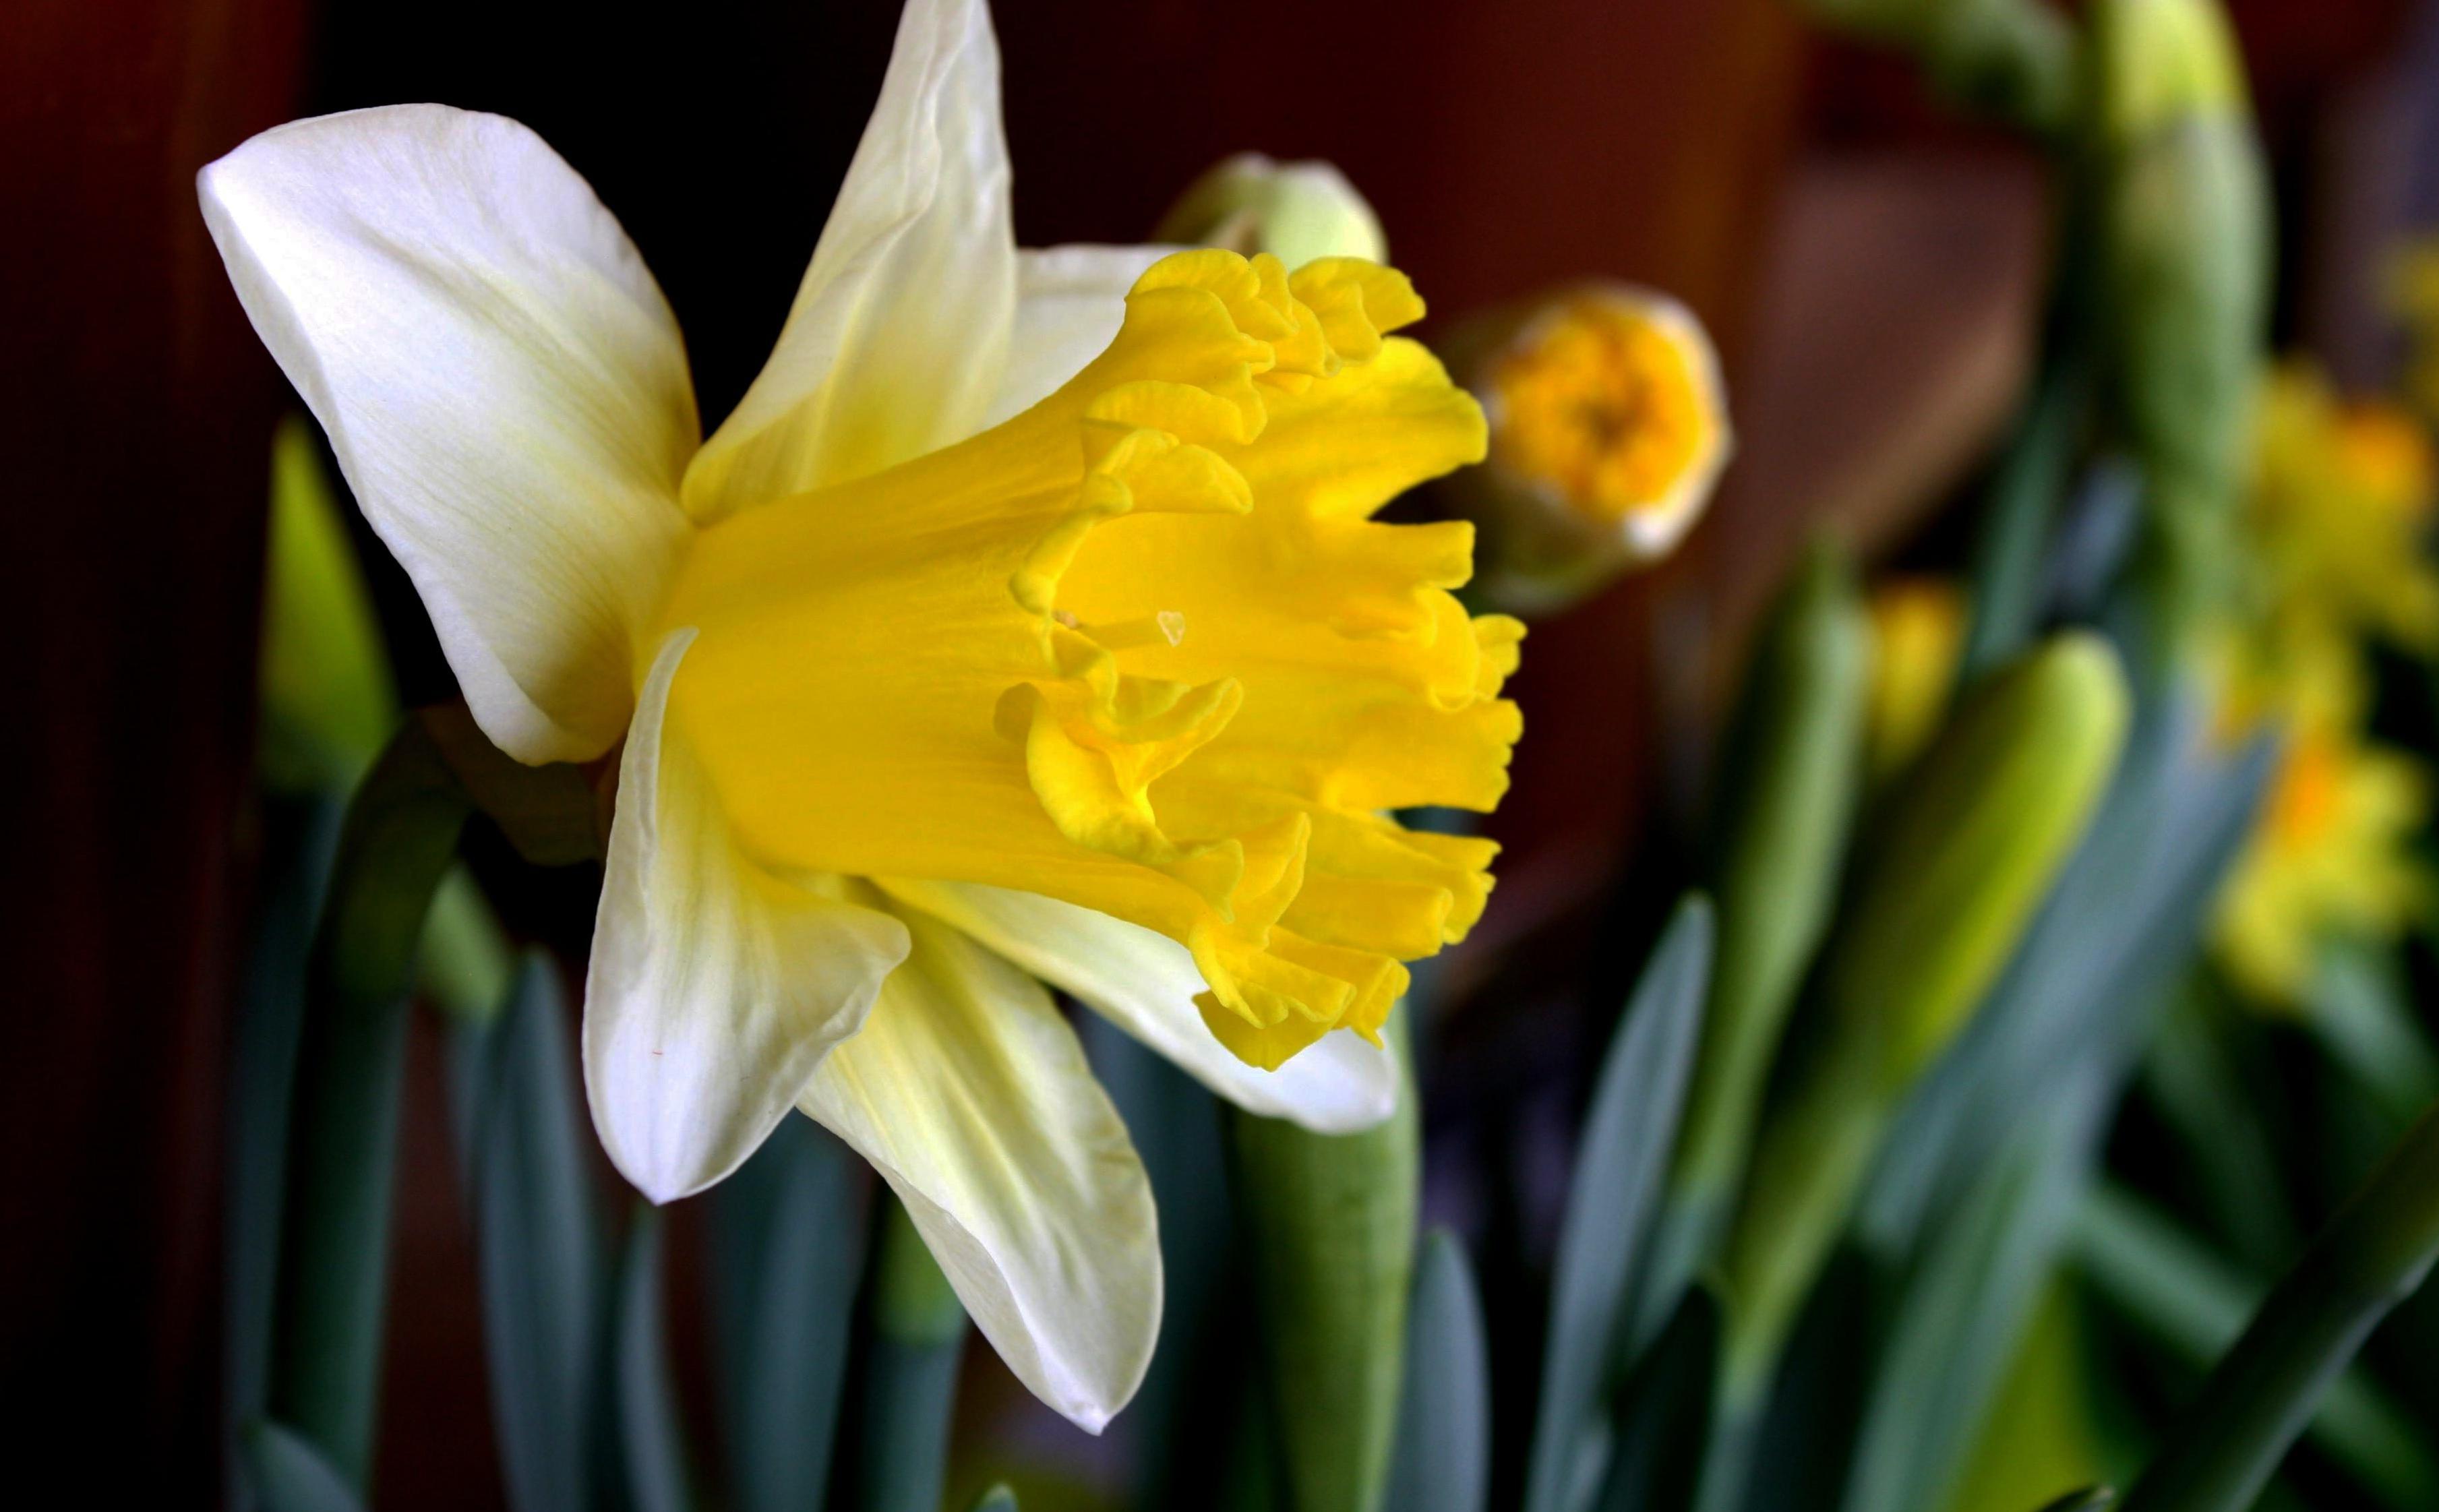 daffodils-photo-13